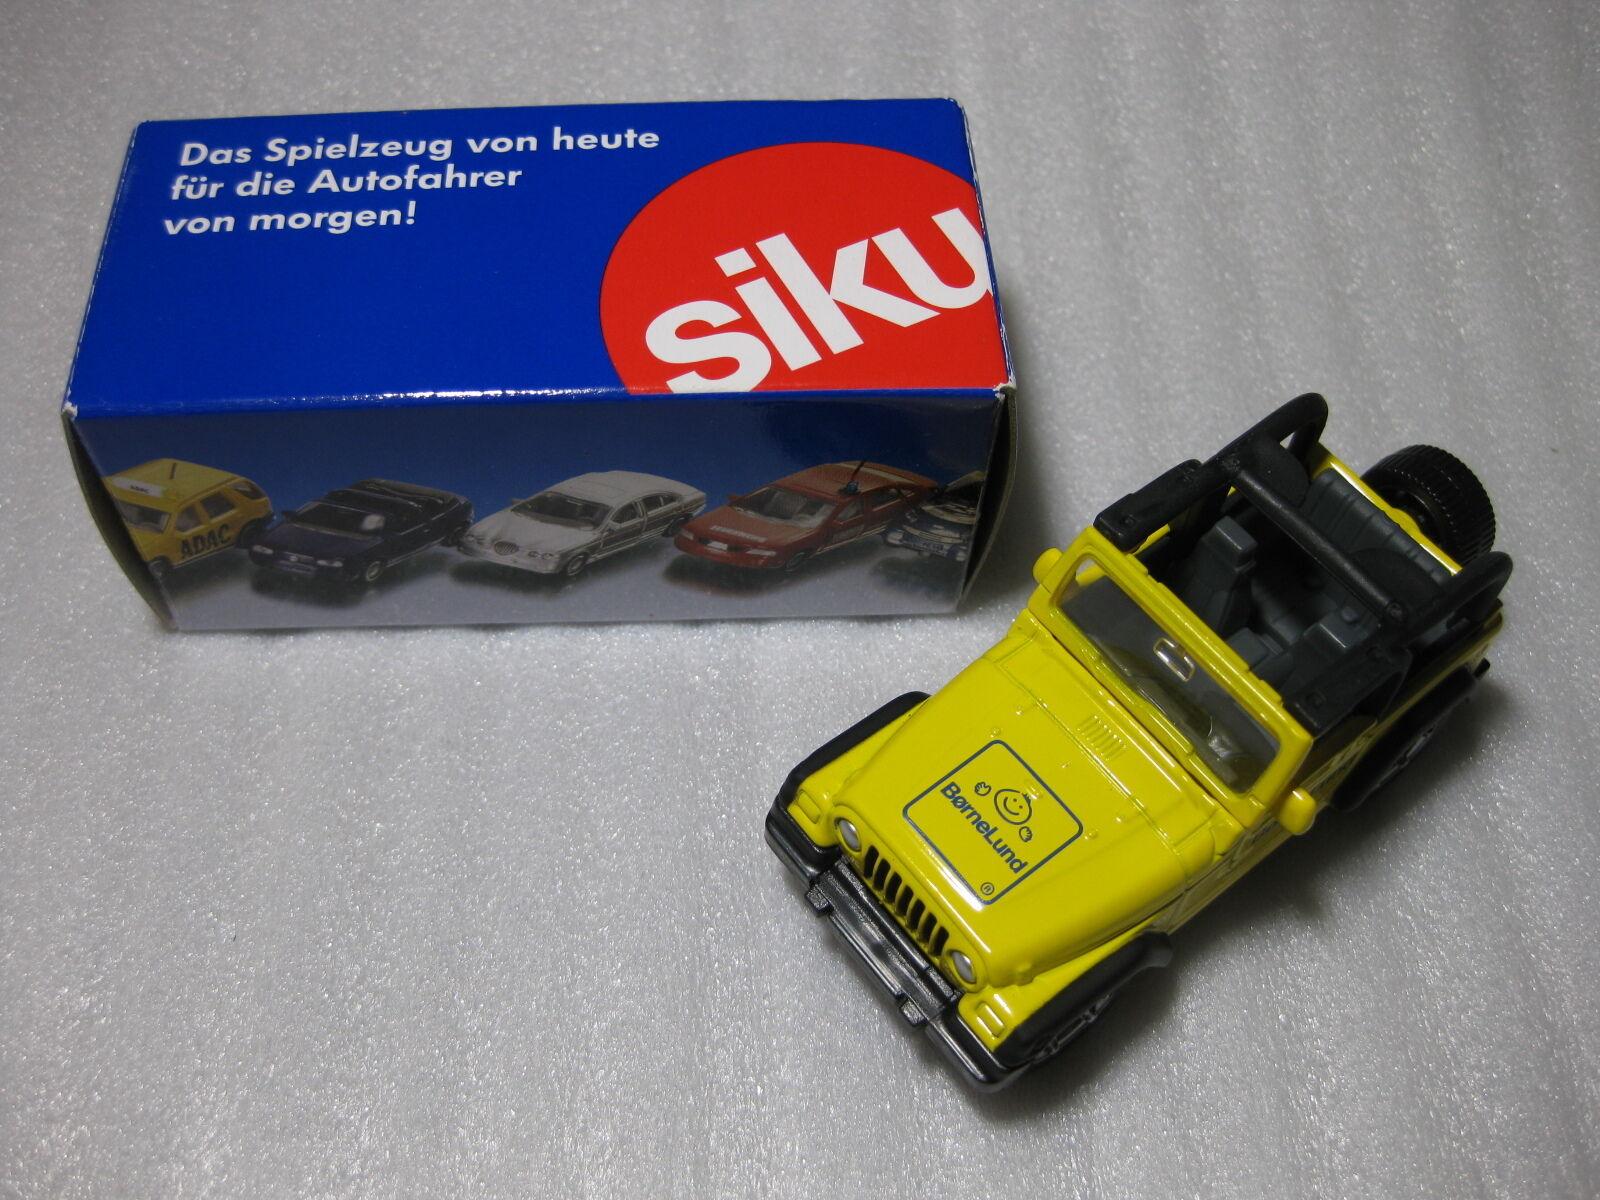 SIKU JEEP WRANGLER Bornelund 2009 Exclusive Diecast Model Rare Promo